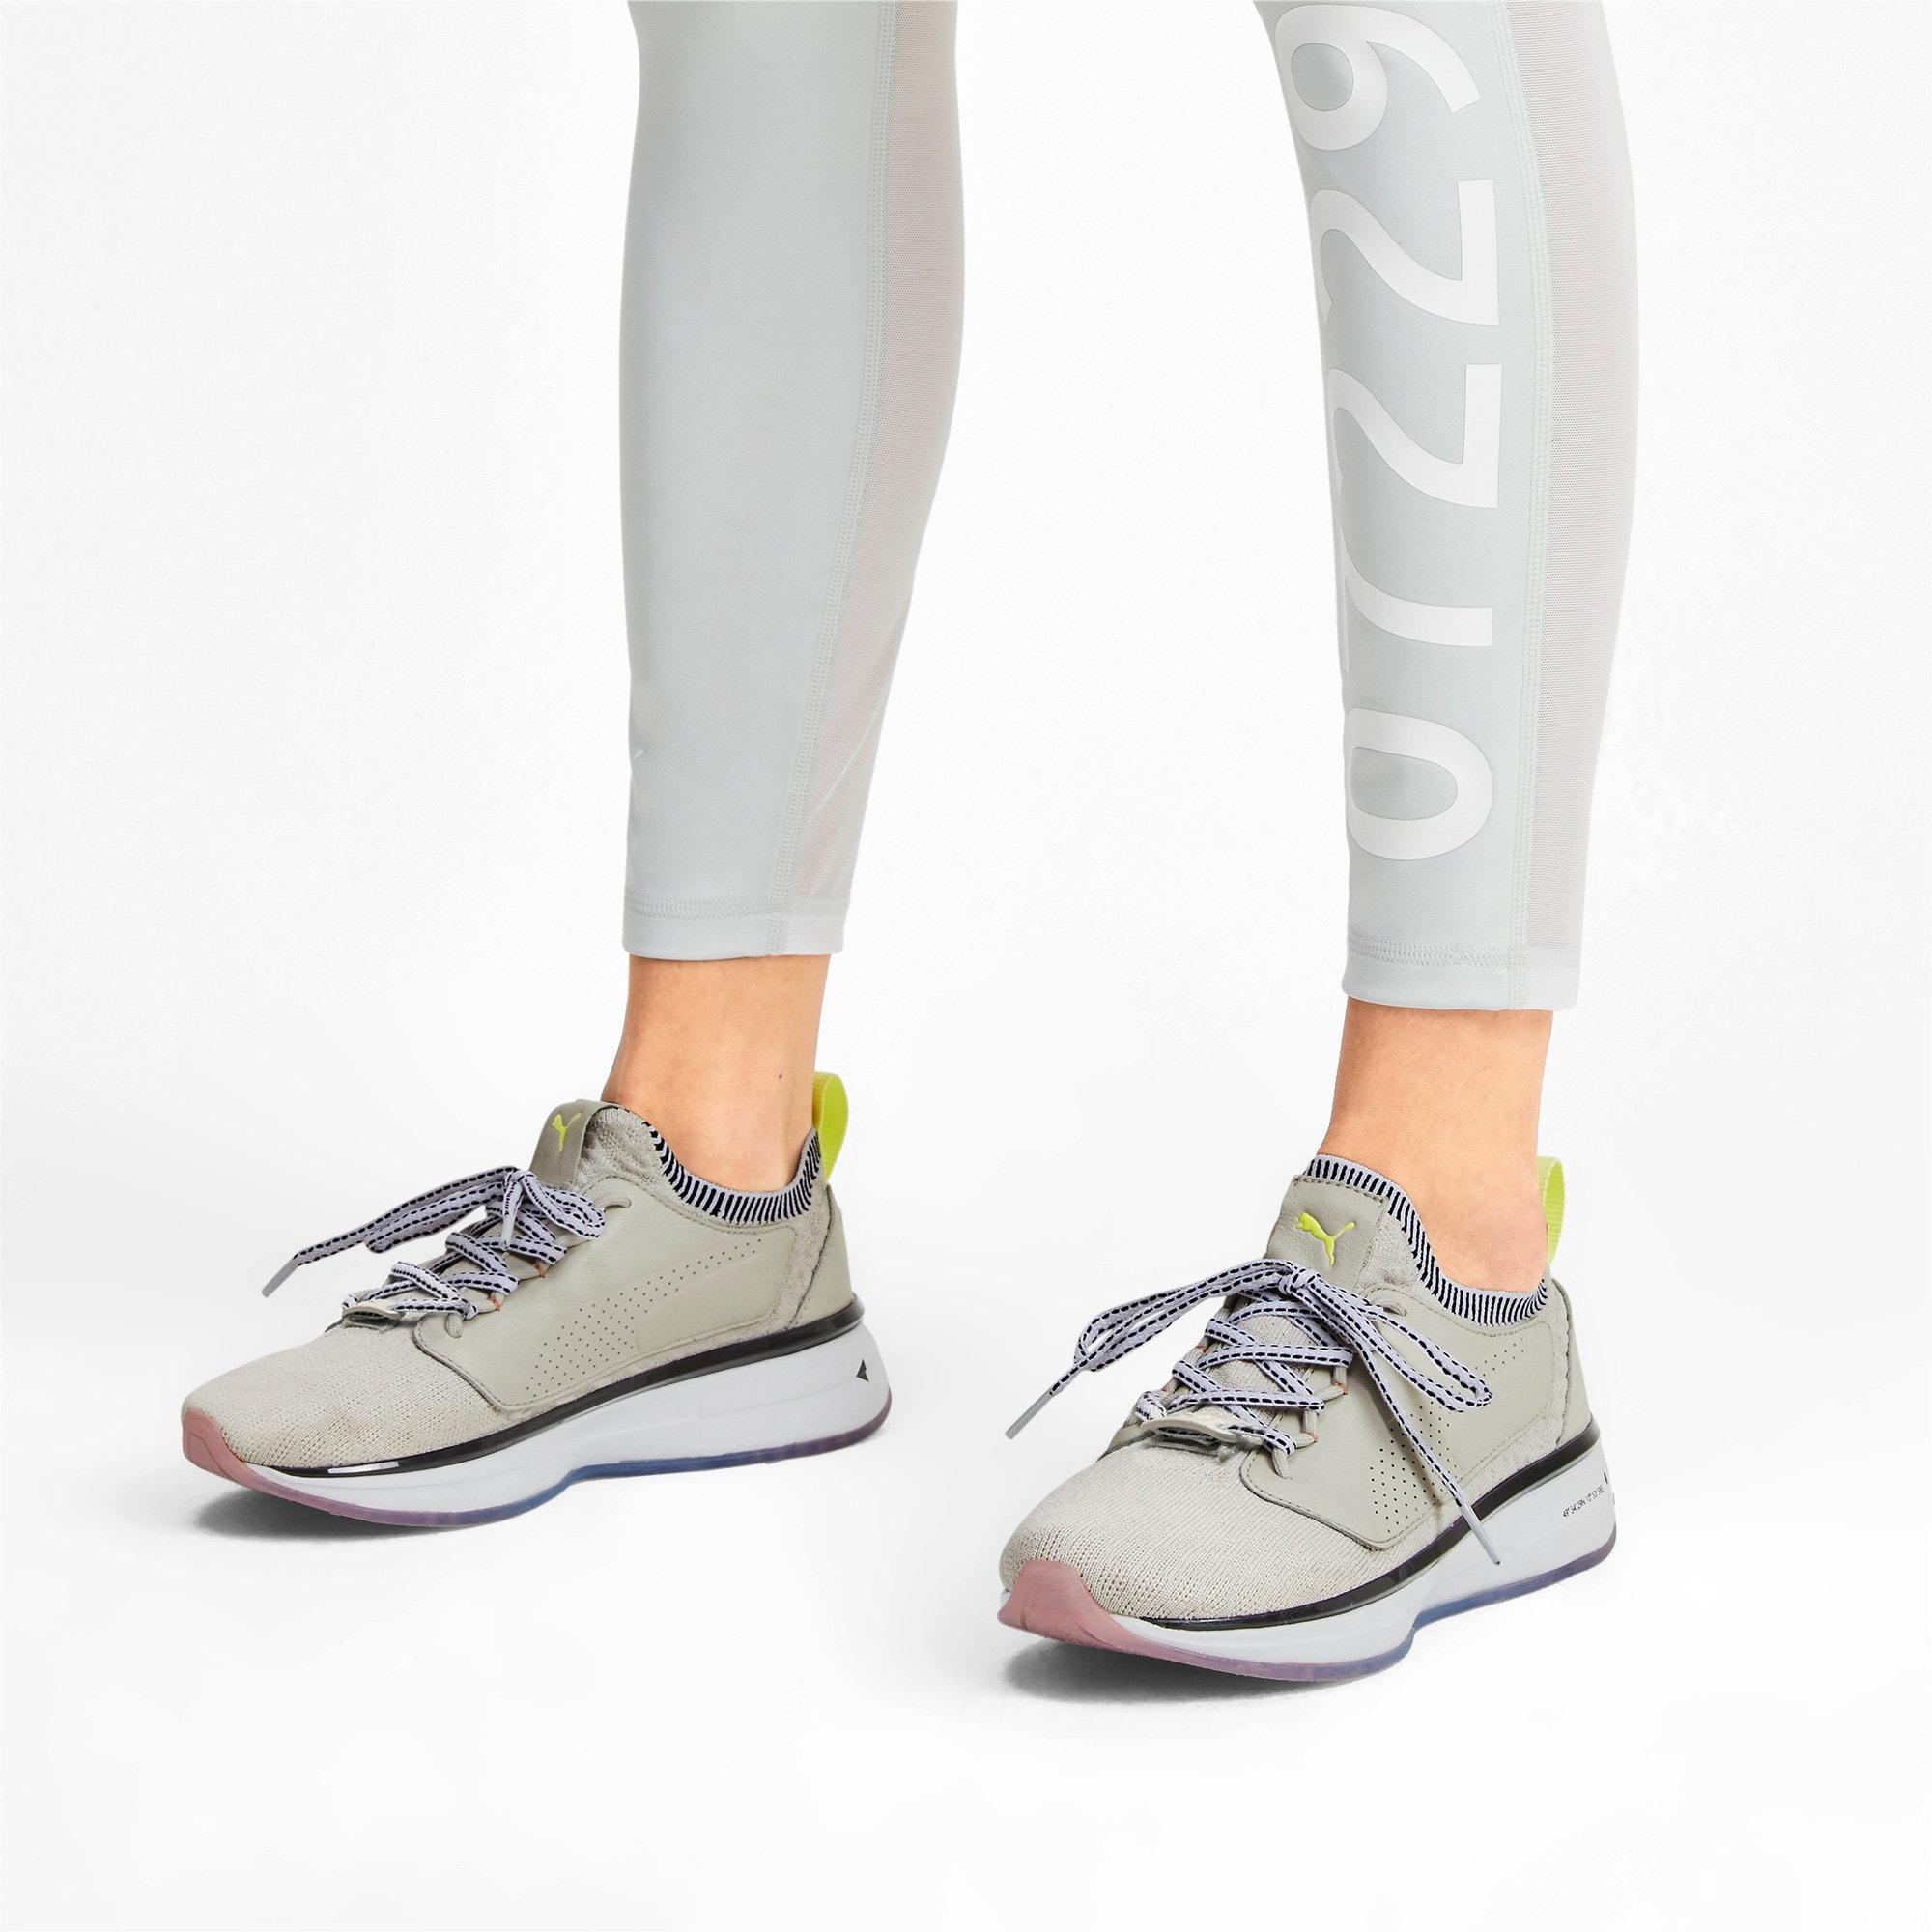 Thumbnail 2 of SG Runner Strength Women's Training Shoes, Glacier Gray-Puma White, medium